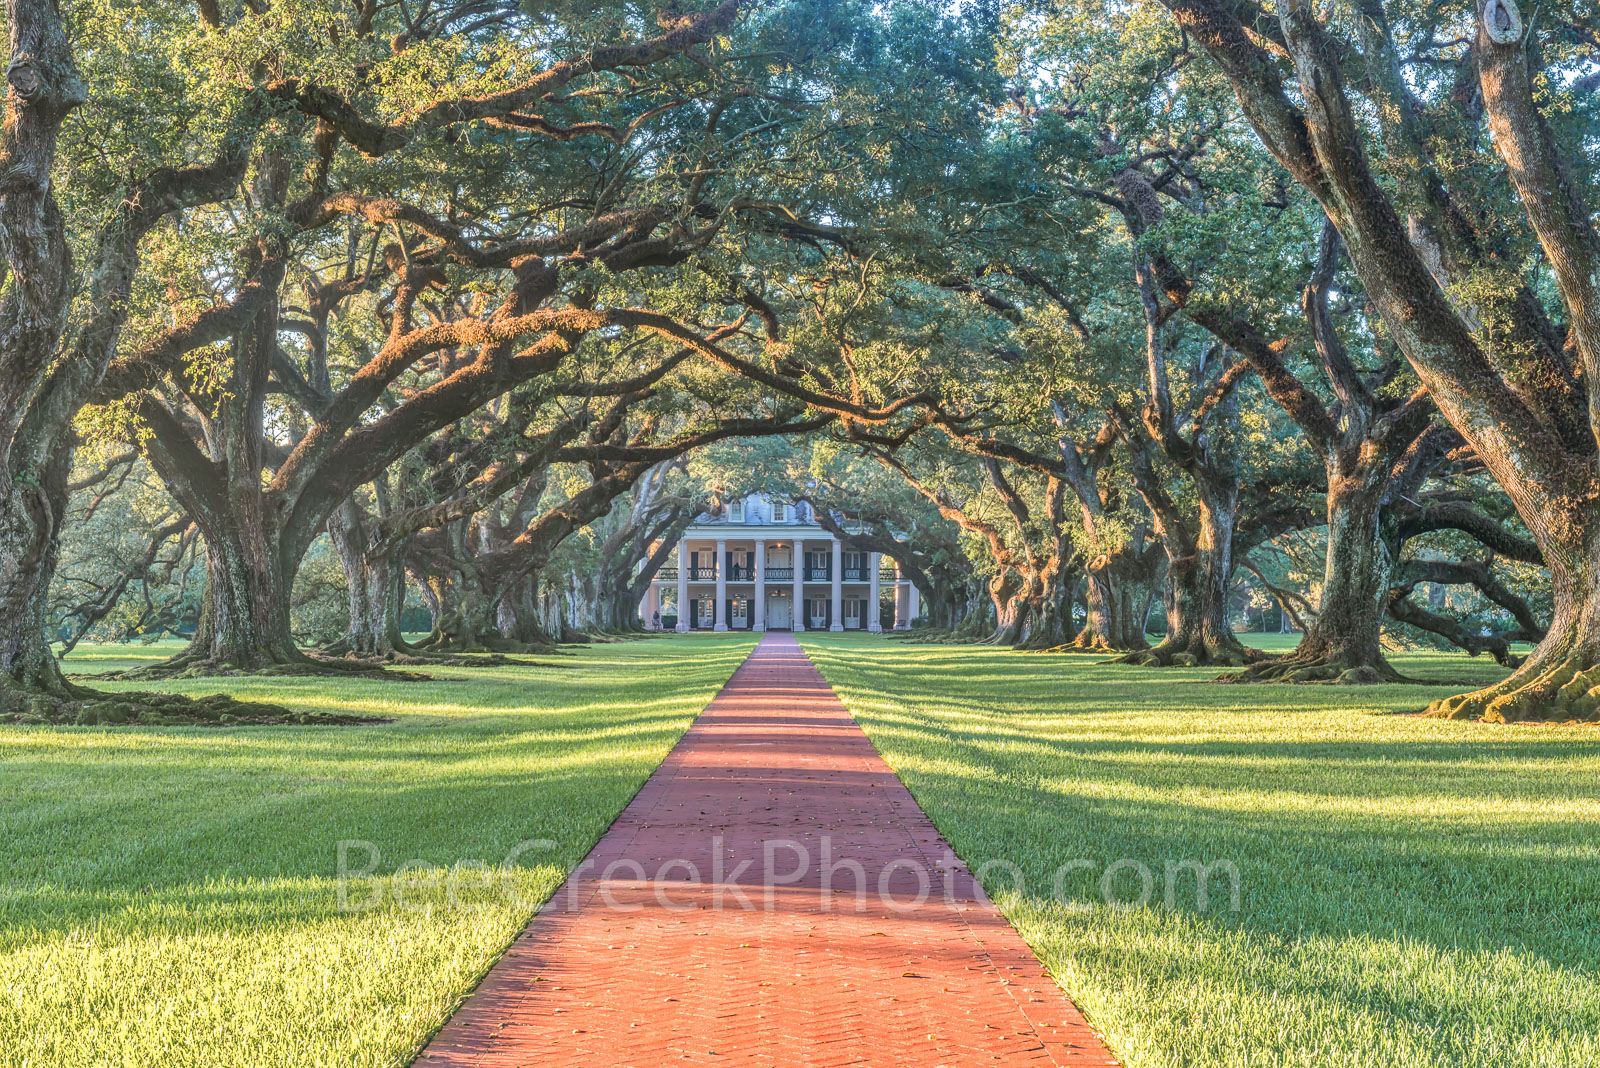 Lousiana, National Historic Landmark, Oak Alley, Sunrise, big house, canopy, landscape, landscapes, mansion, mississippi, oak trees, plantation, sidewalk, slaves, sugar cane, photo